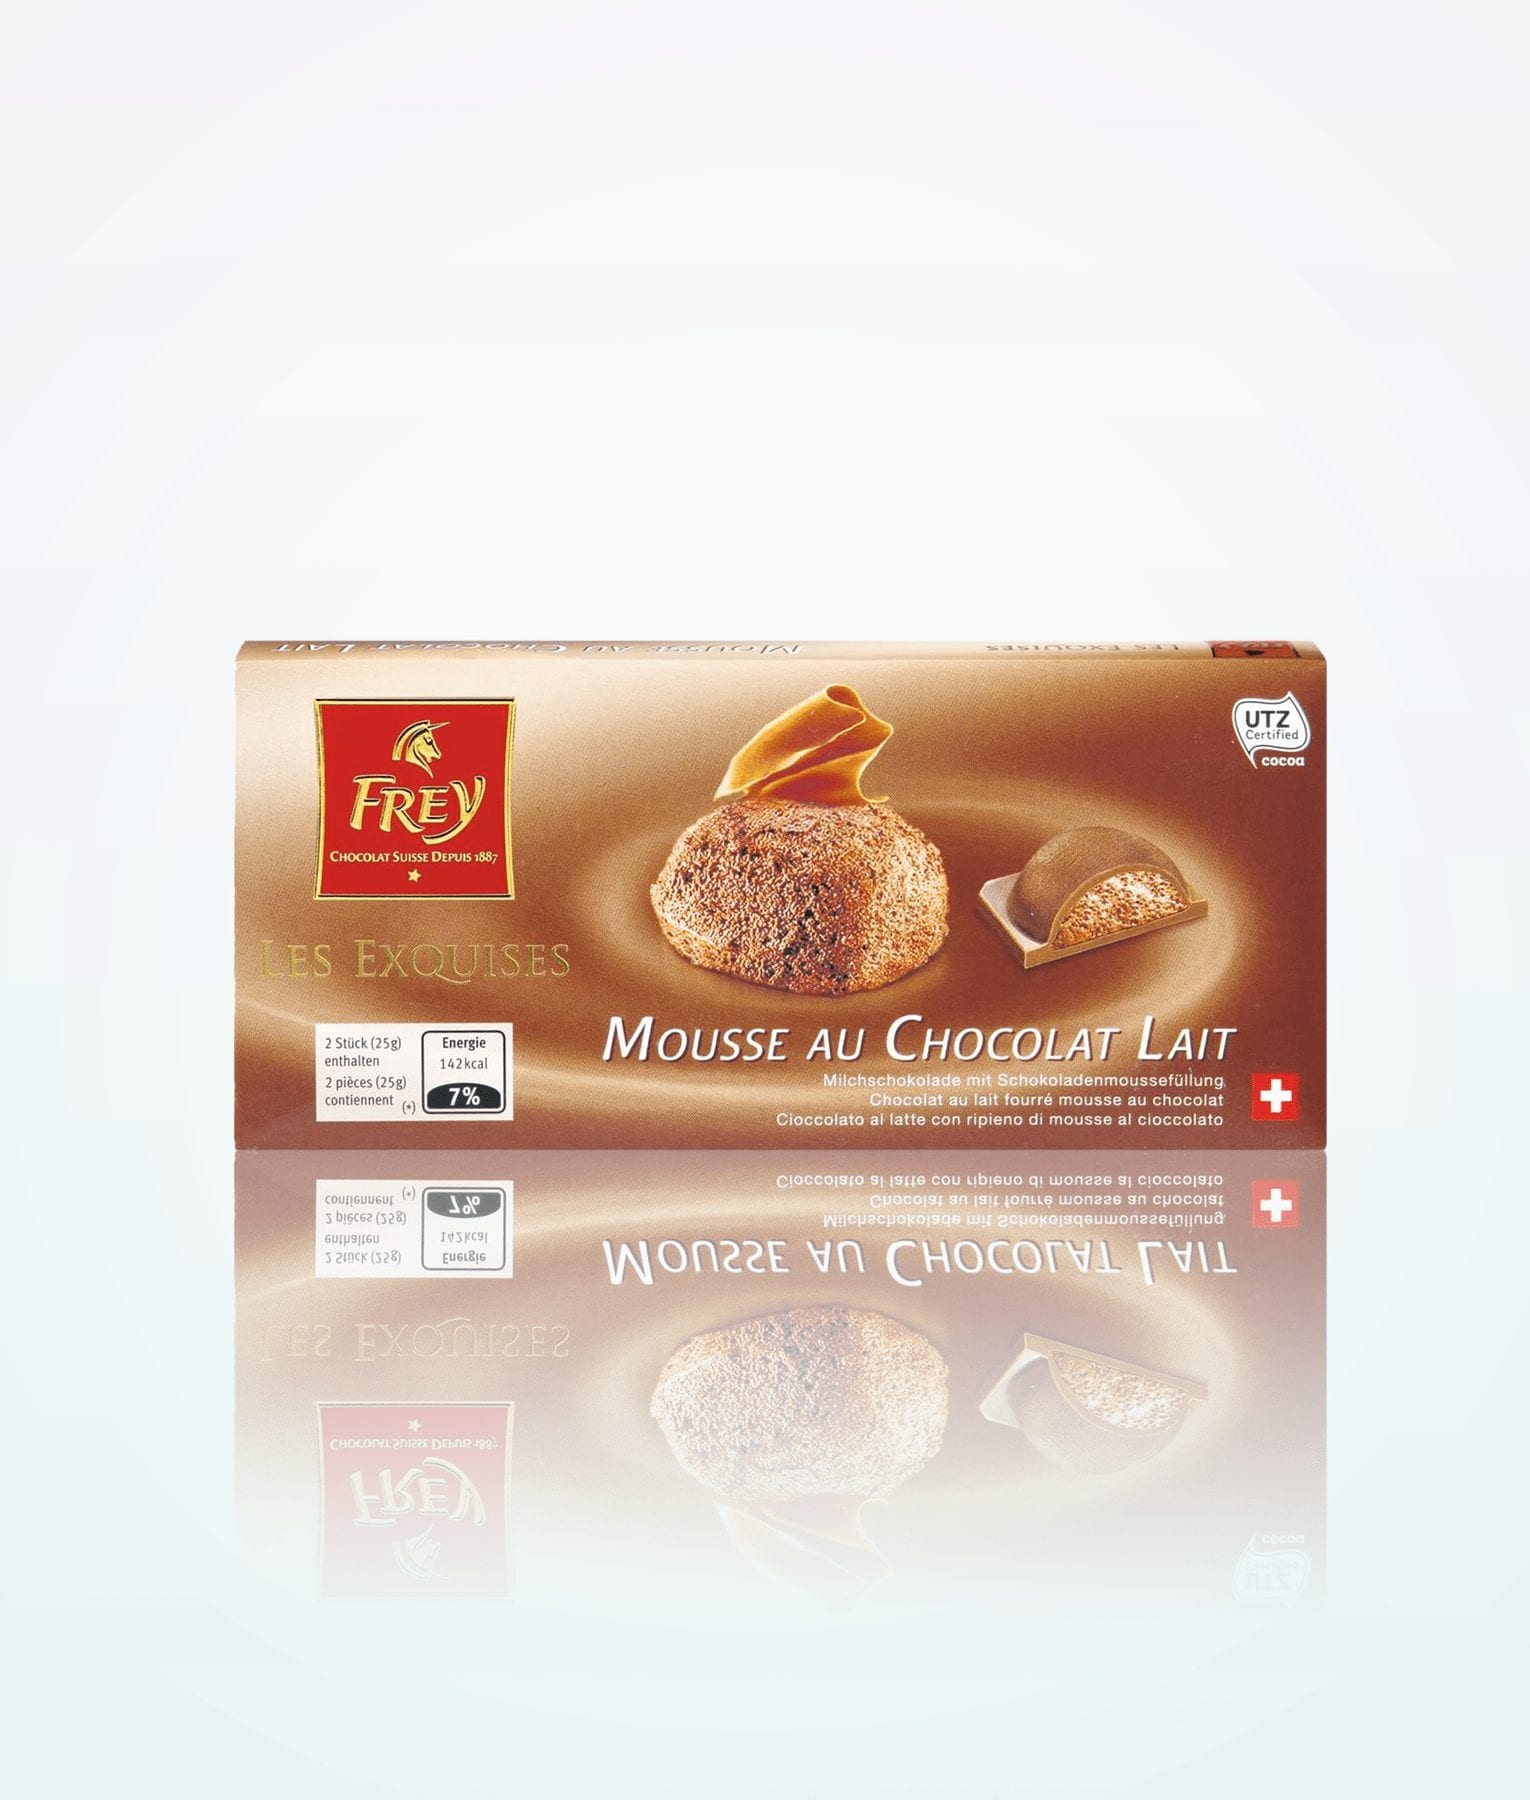 frey-les-mousse-chocolate-swissmade-direct